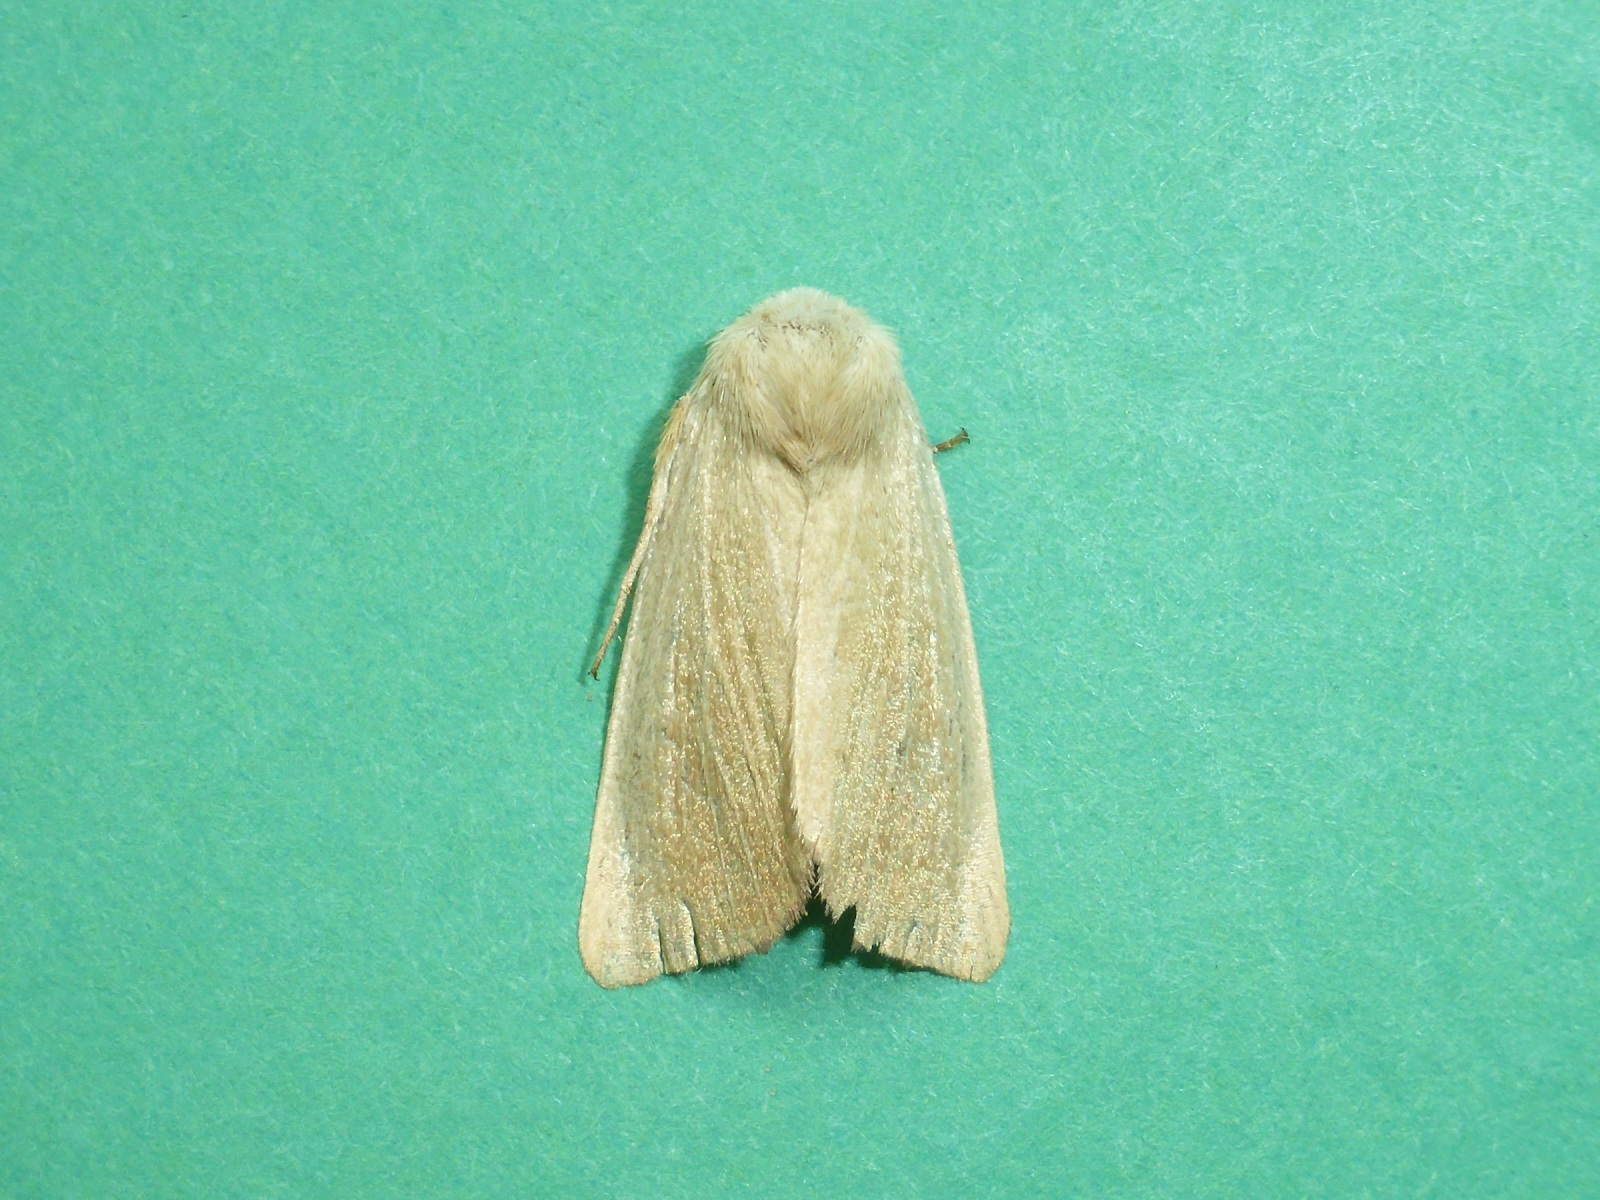 Arenostola phragmitidis -  Fen Wainscot - Kirk Smeaton